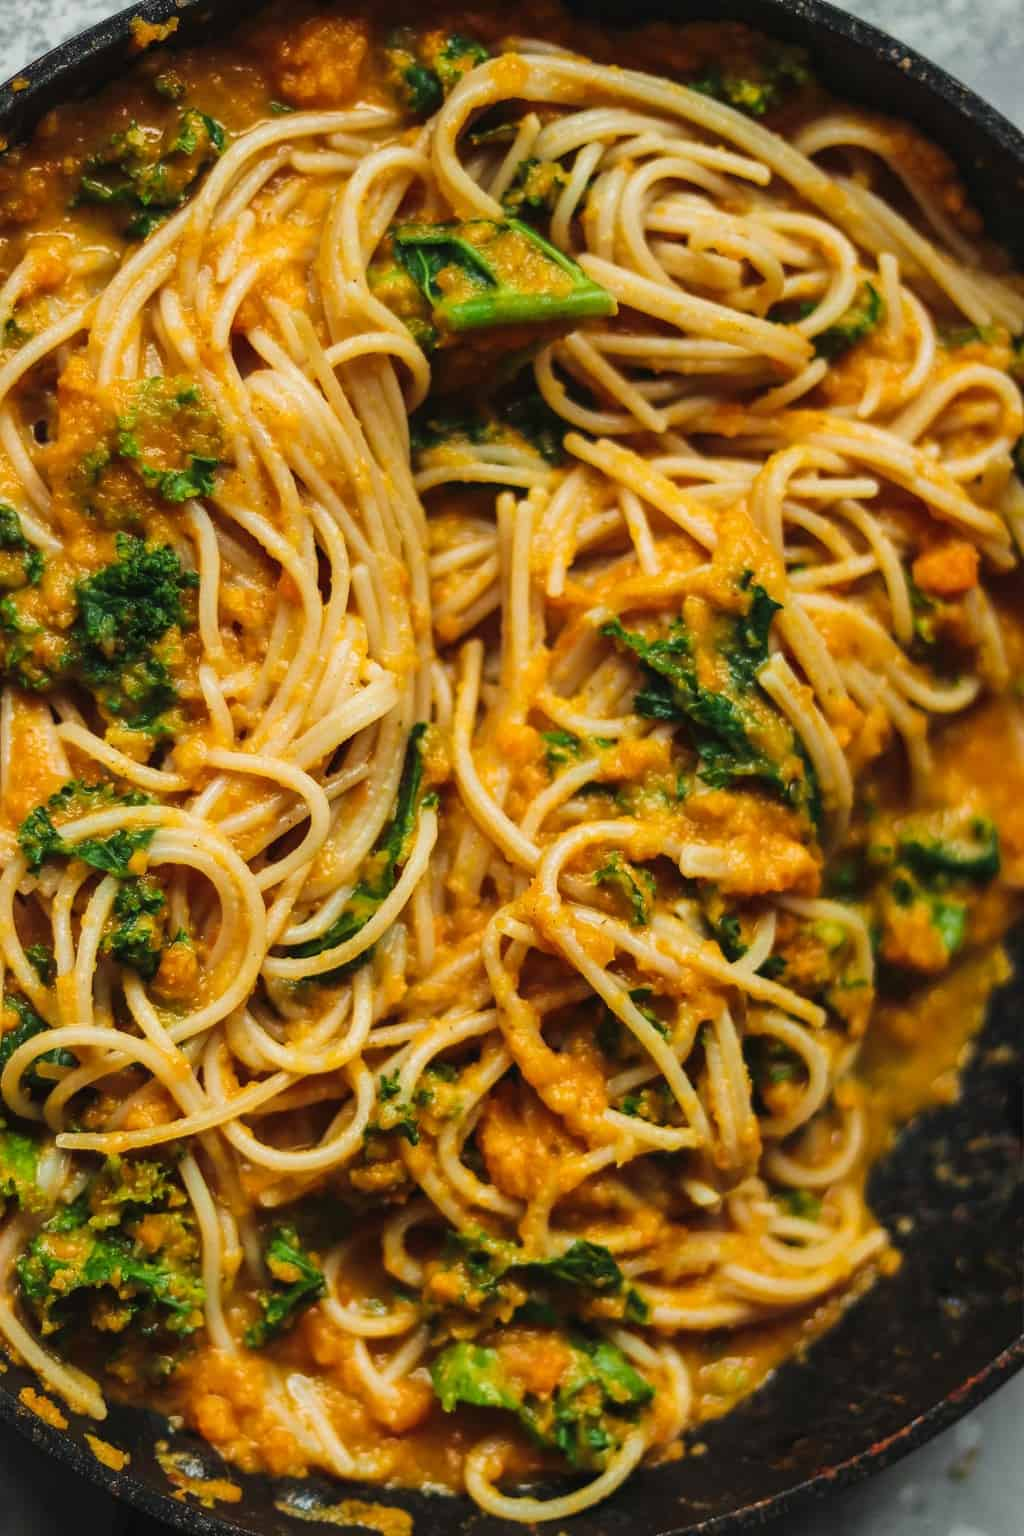 Pumpkin pasta in a frying pan